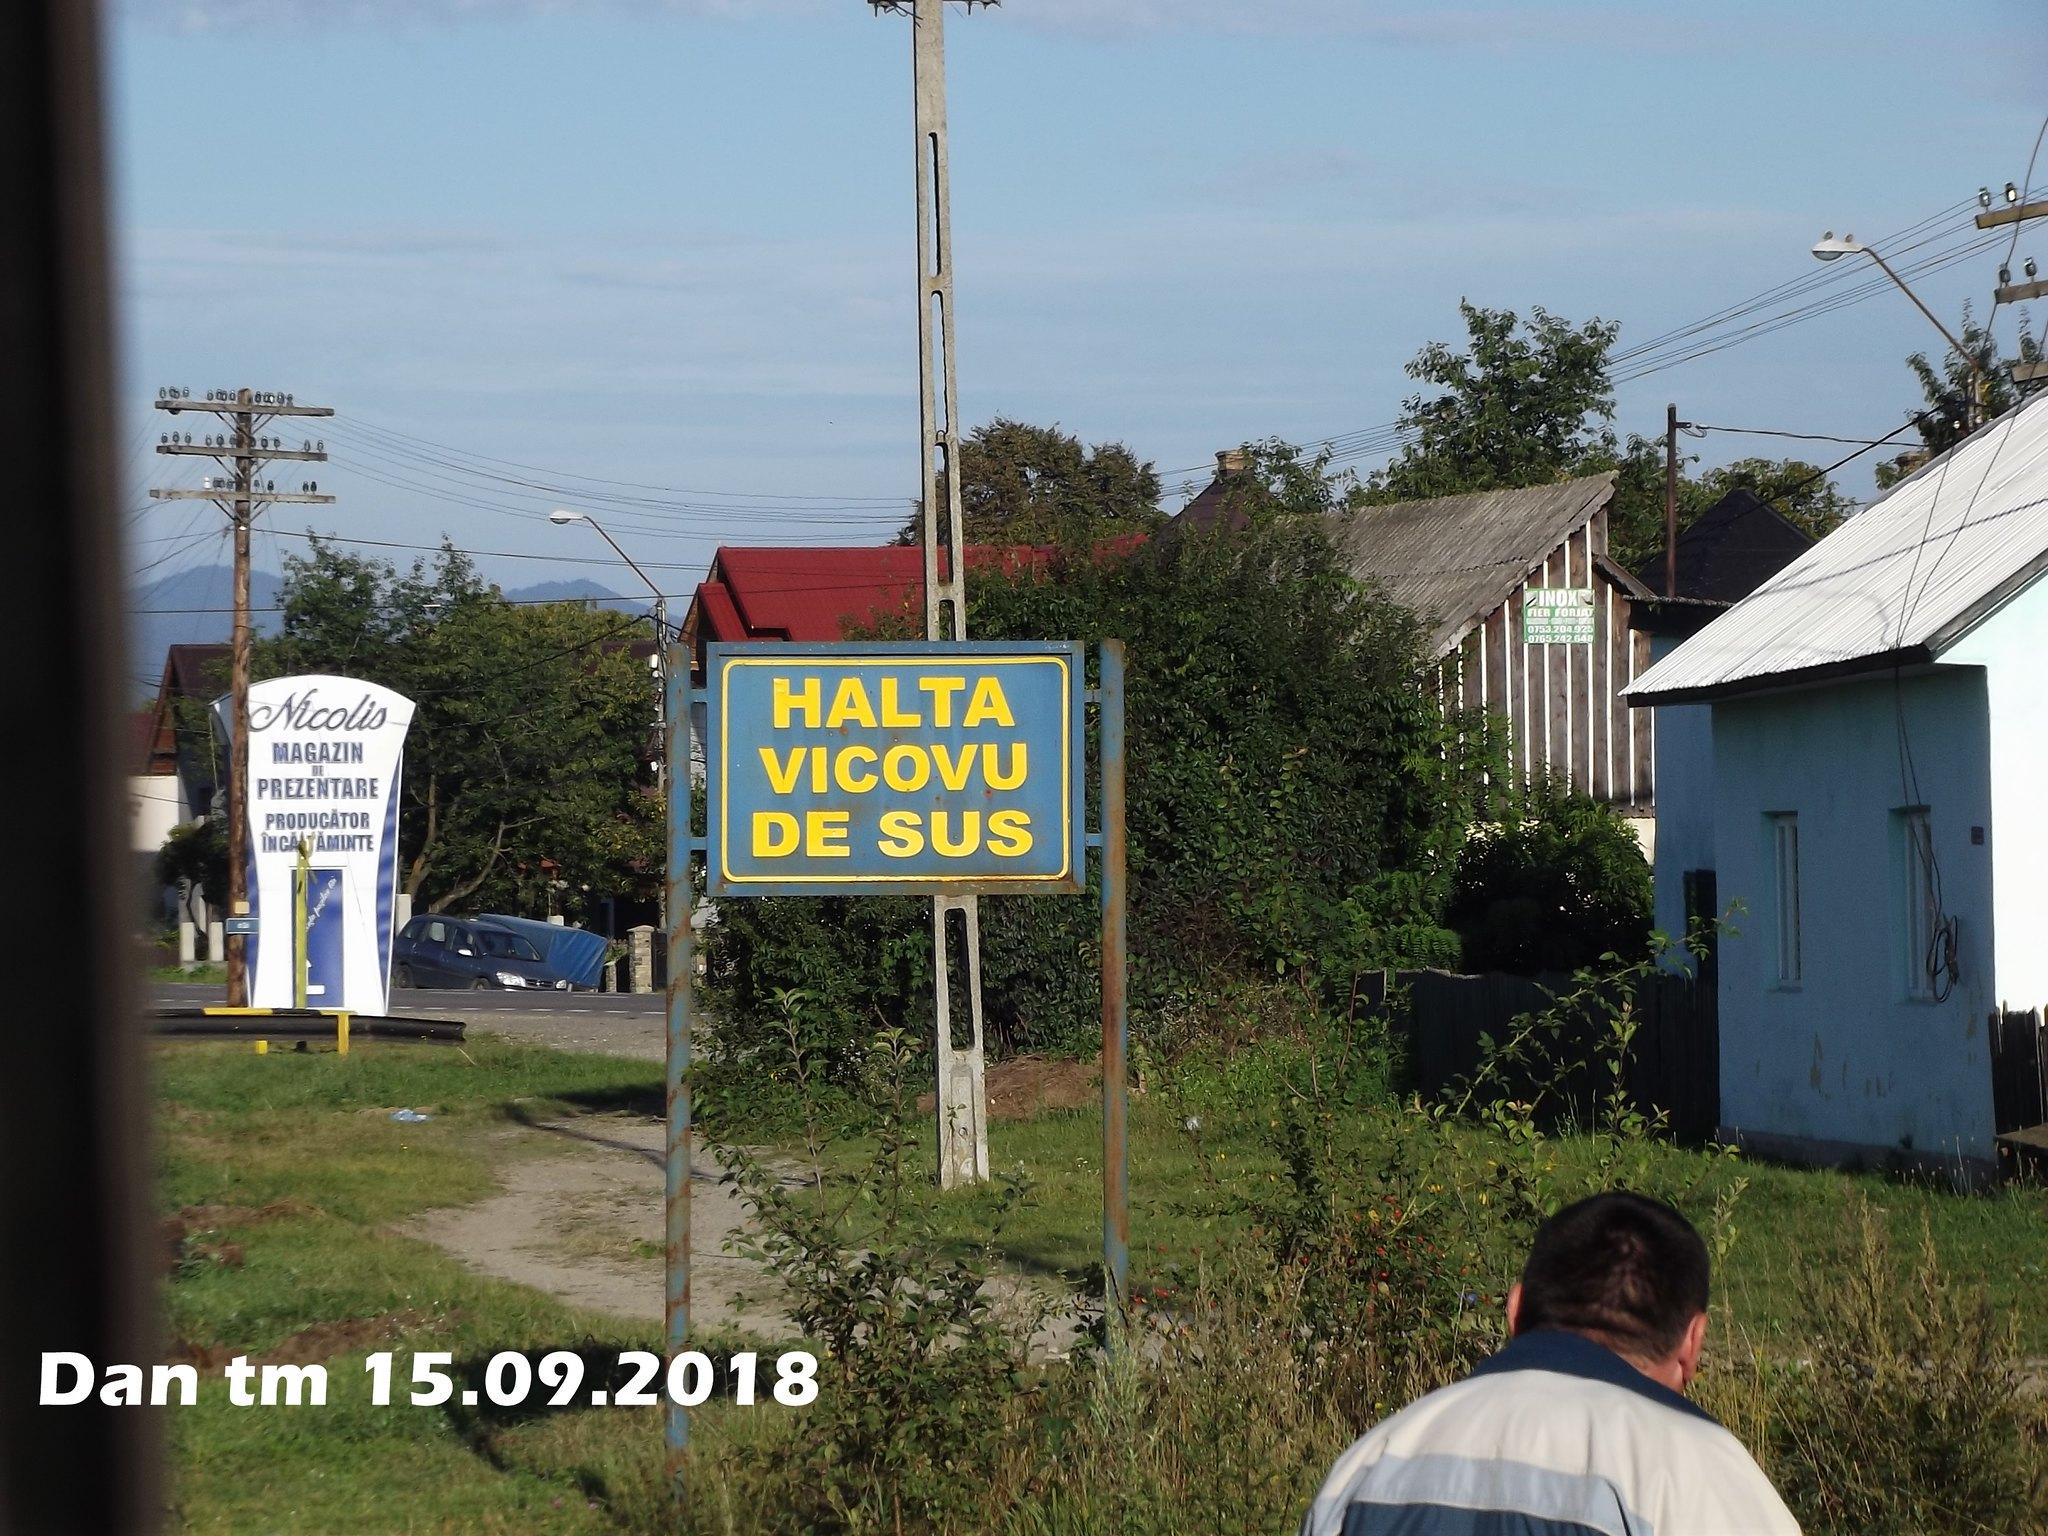 515 : Dorneşti - Gura Putnei - (Putna) - Nisipitu - Seletin UKR - Pagina 47 44685368532_b4345305a6_k